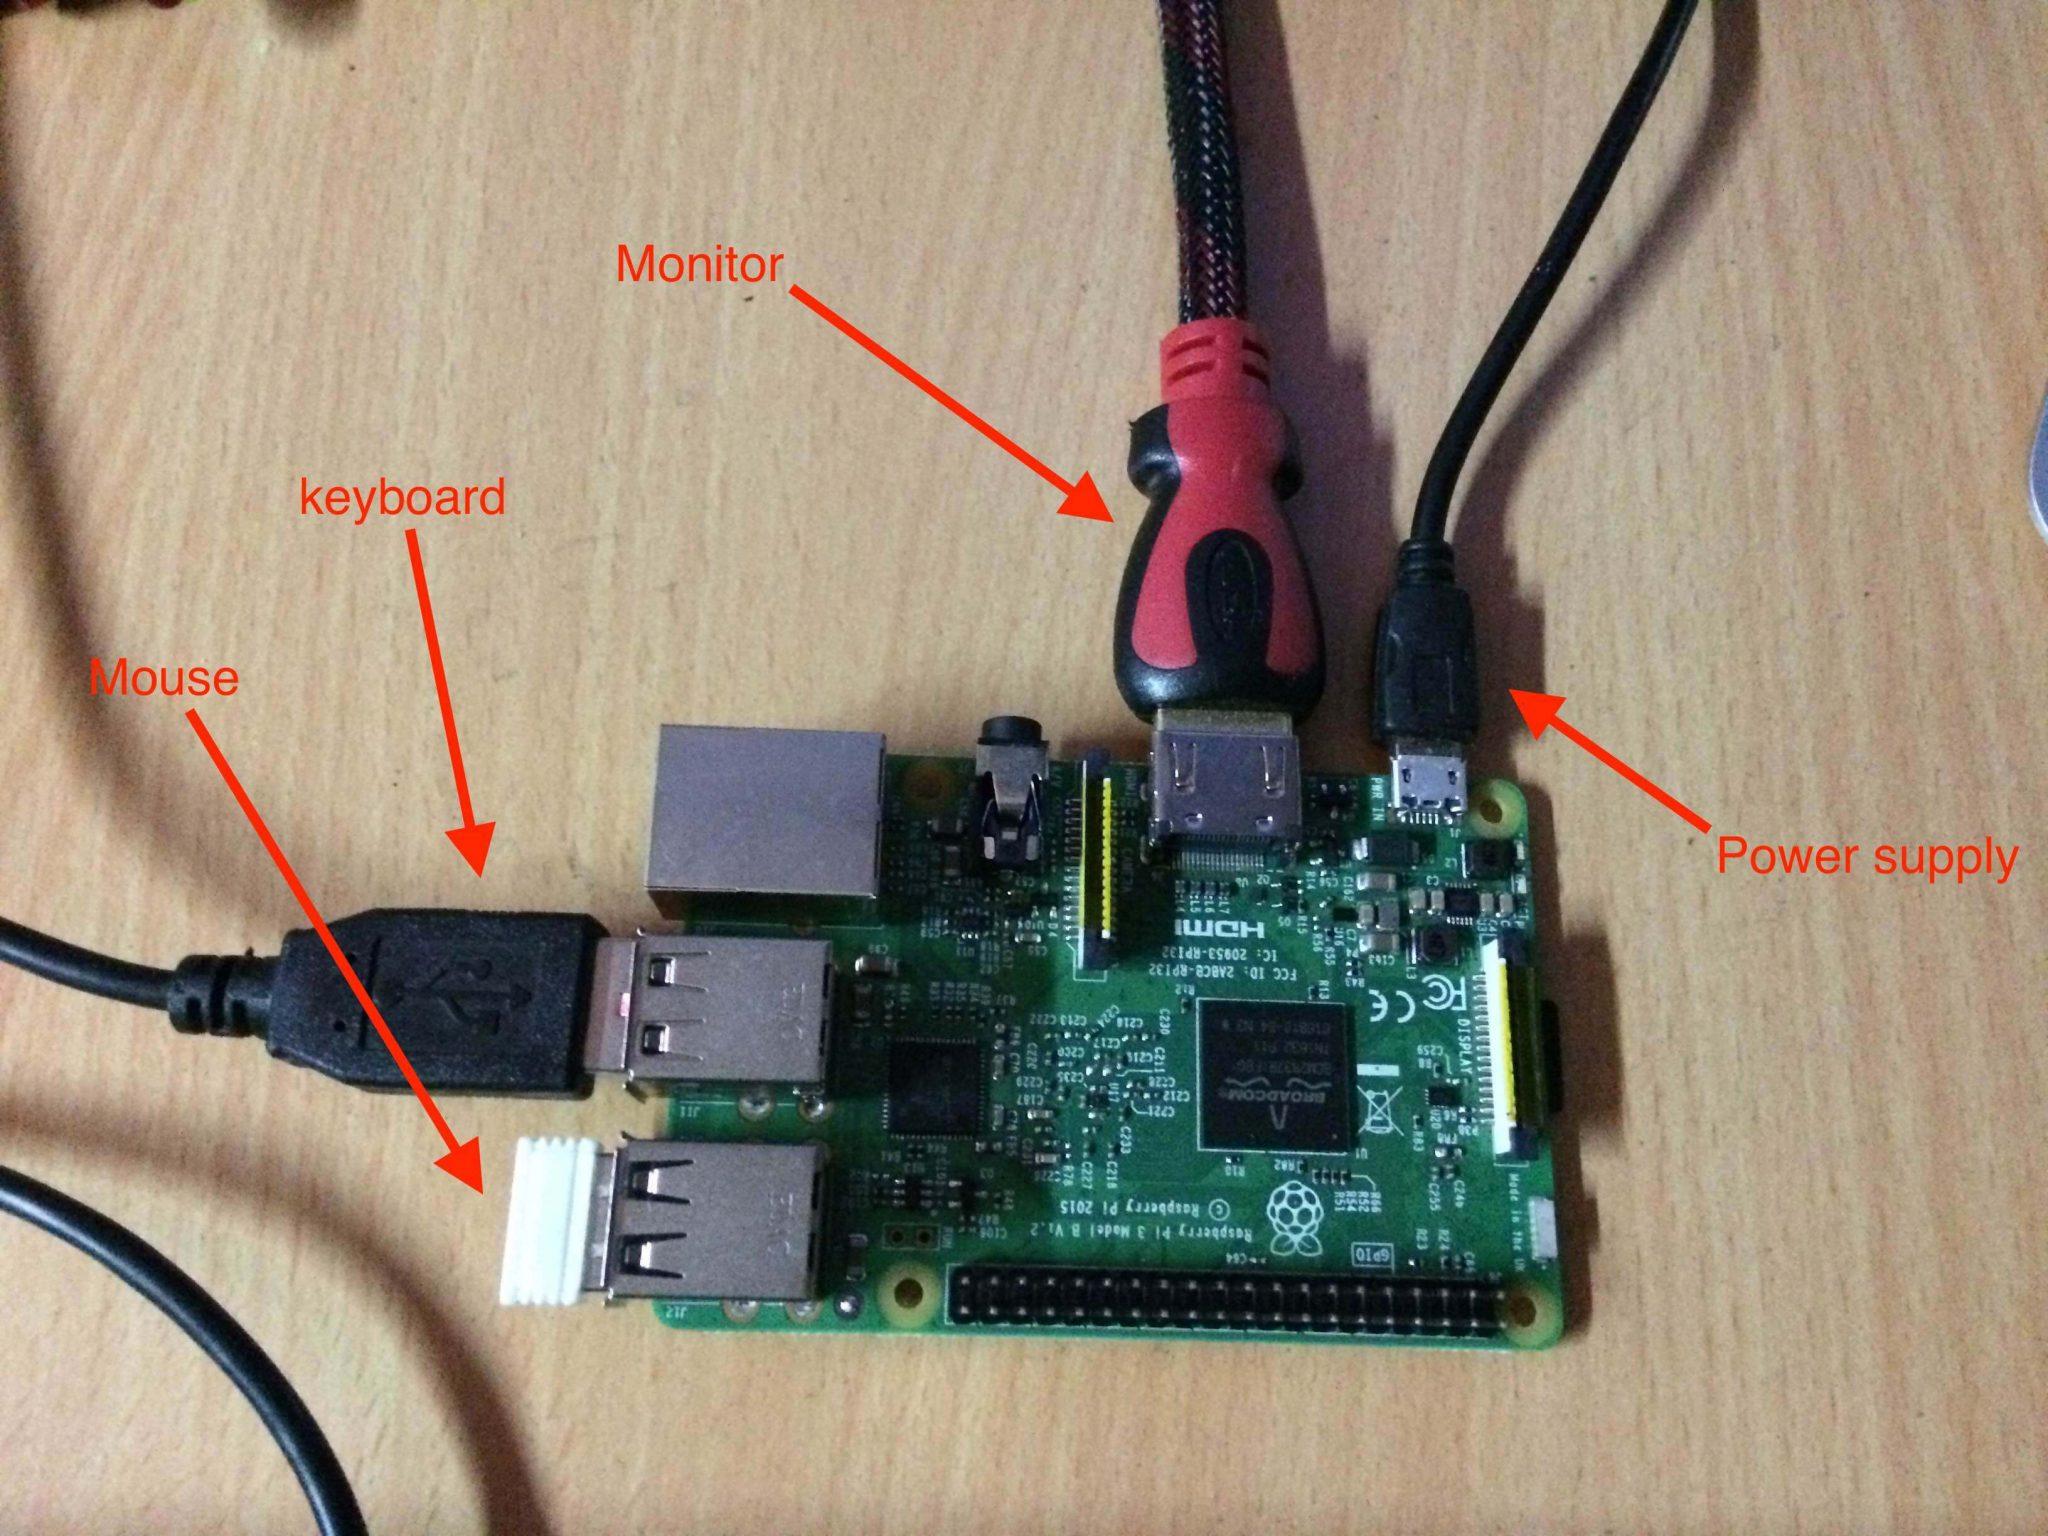 RaspberryPI connection